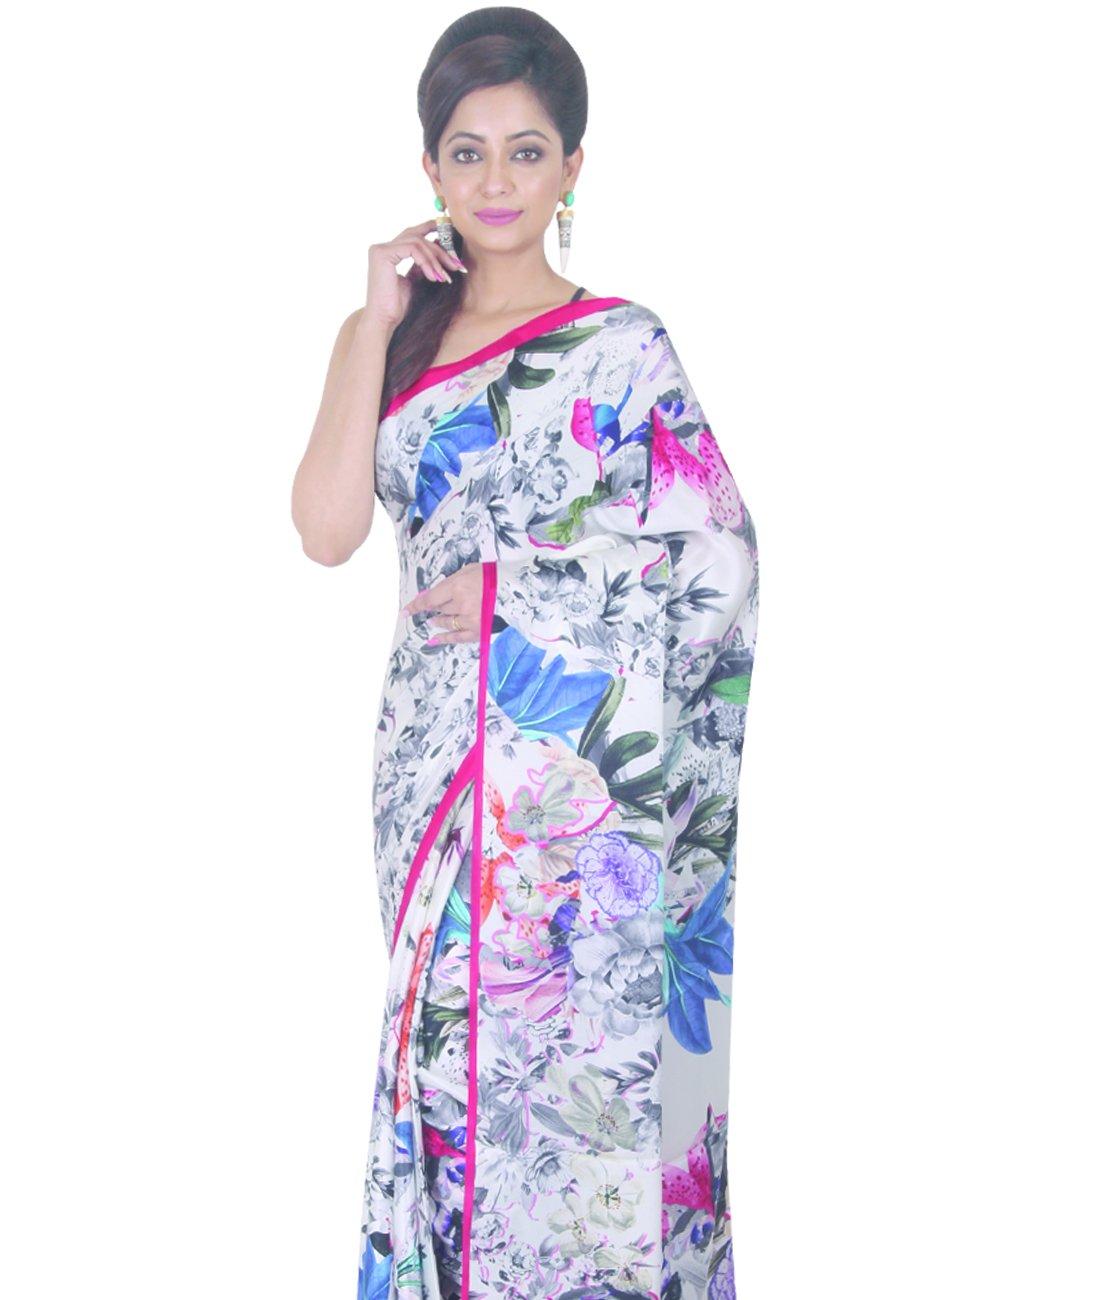 Indian Ethnic Crepe Multicolour Printed Saree by Simaaya Fashions Pvt Ltd (Image #2)